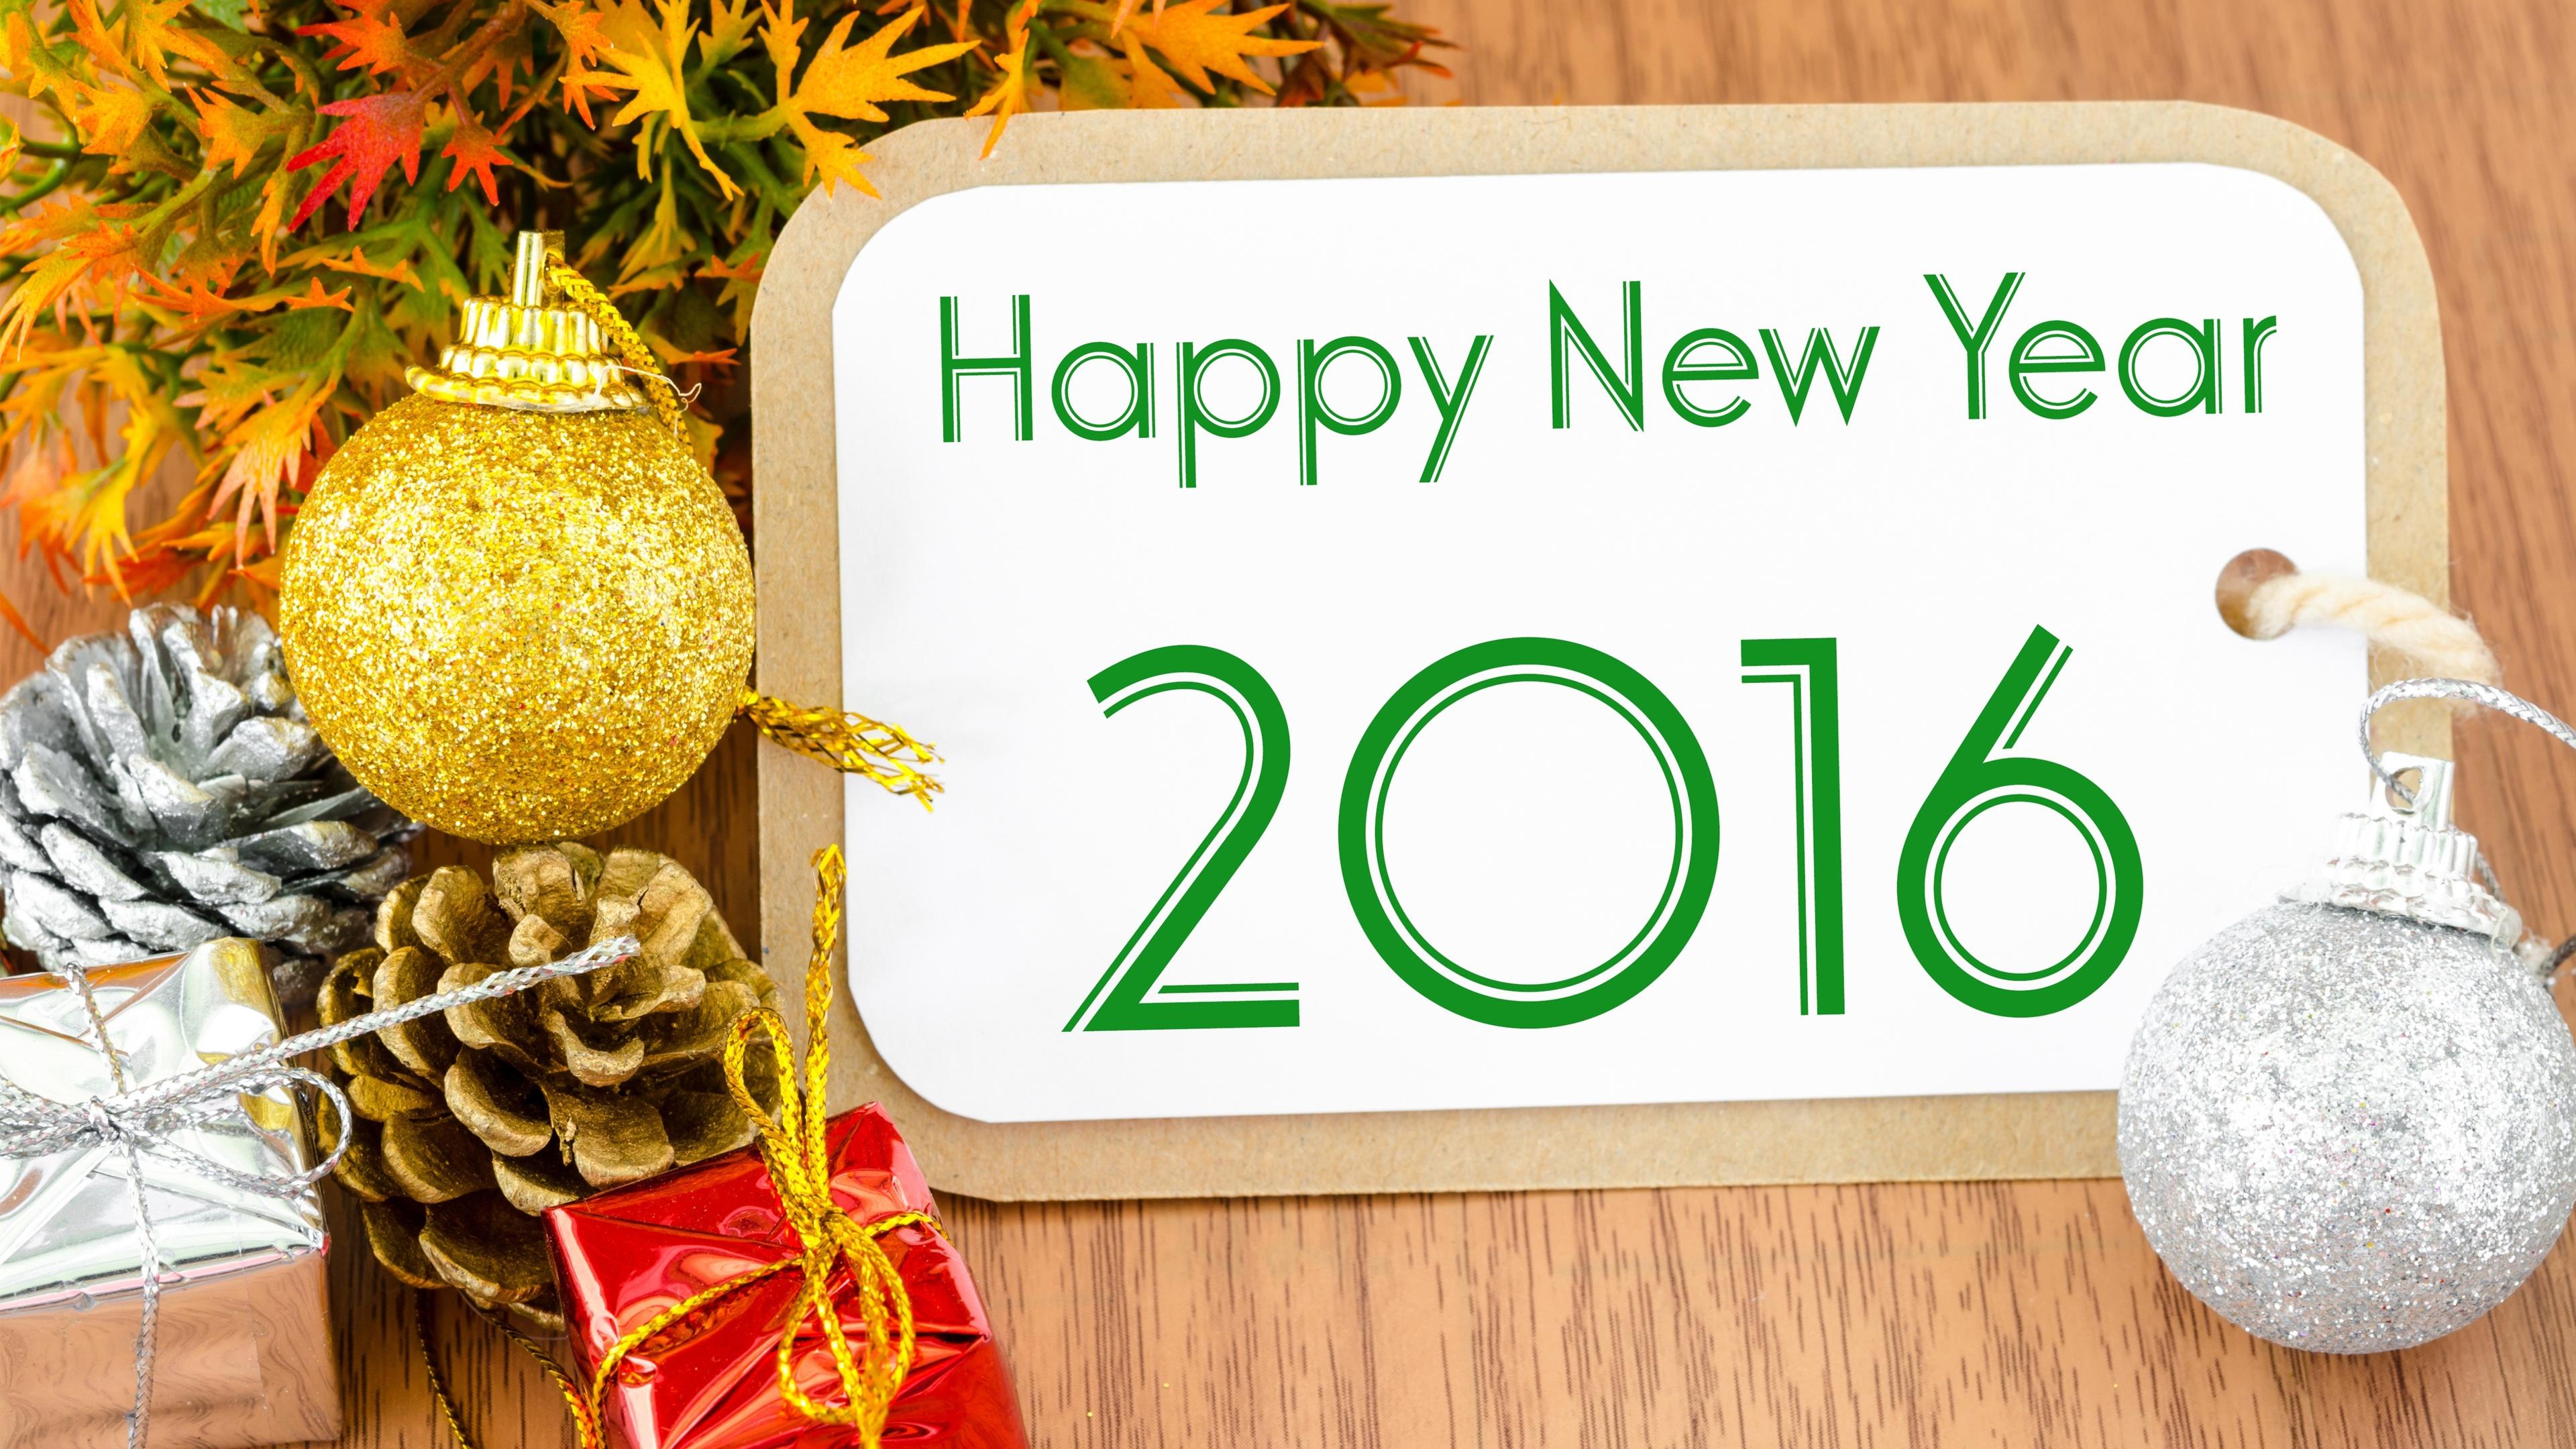 2016_new_year-3840×2160